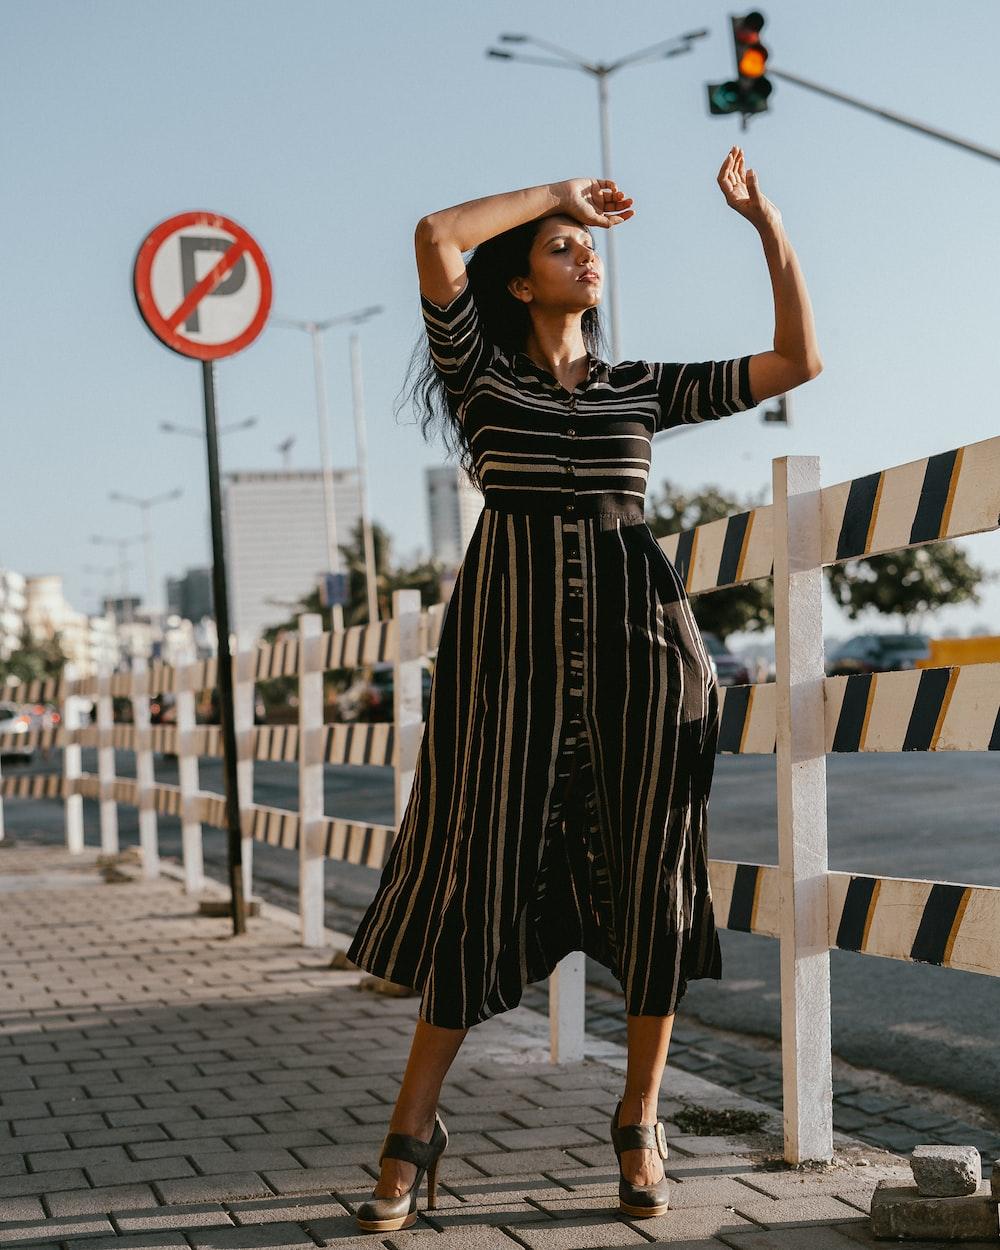 woman wearing black and white striped dress